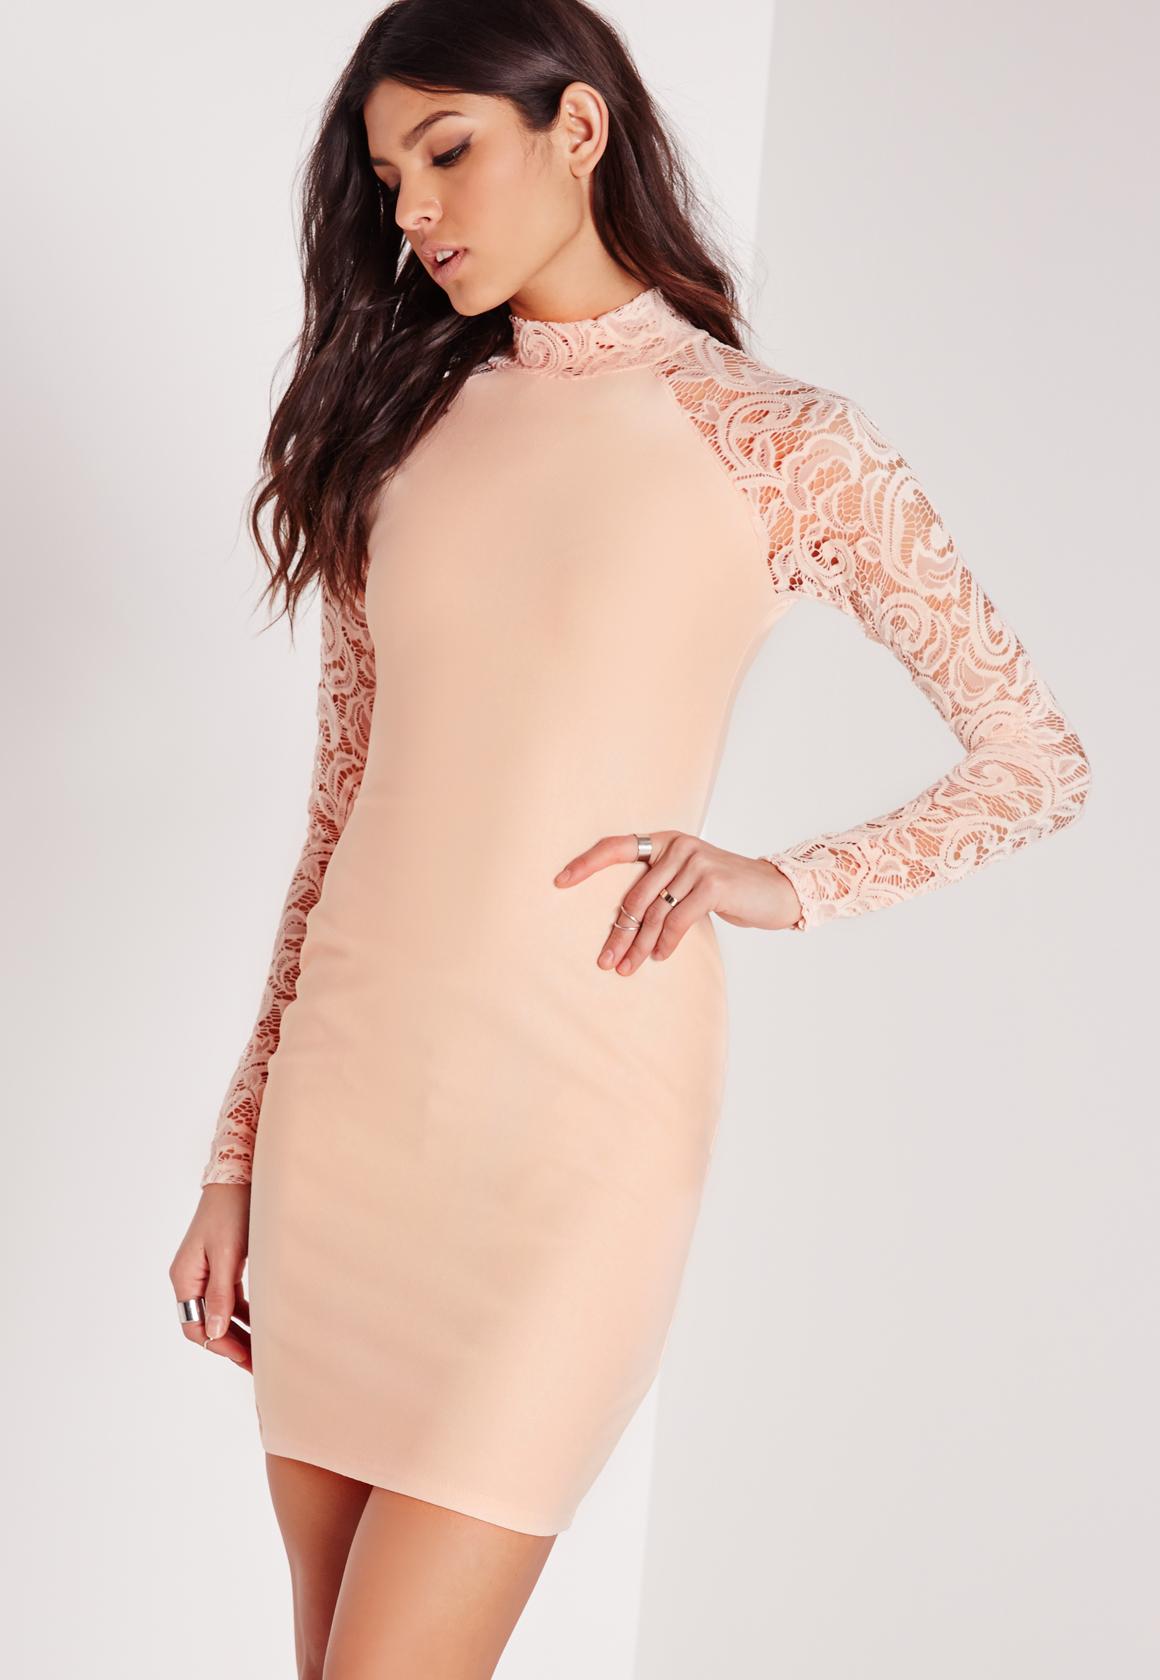 Names lace sleeve dresses teen long bodycon maxx boutique